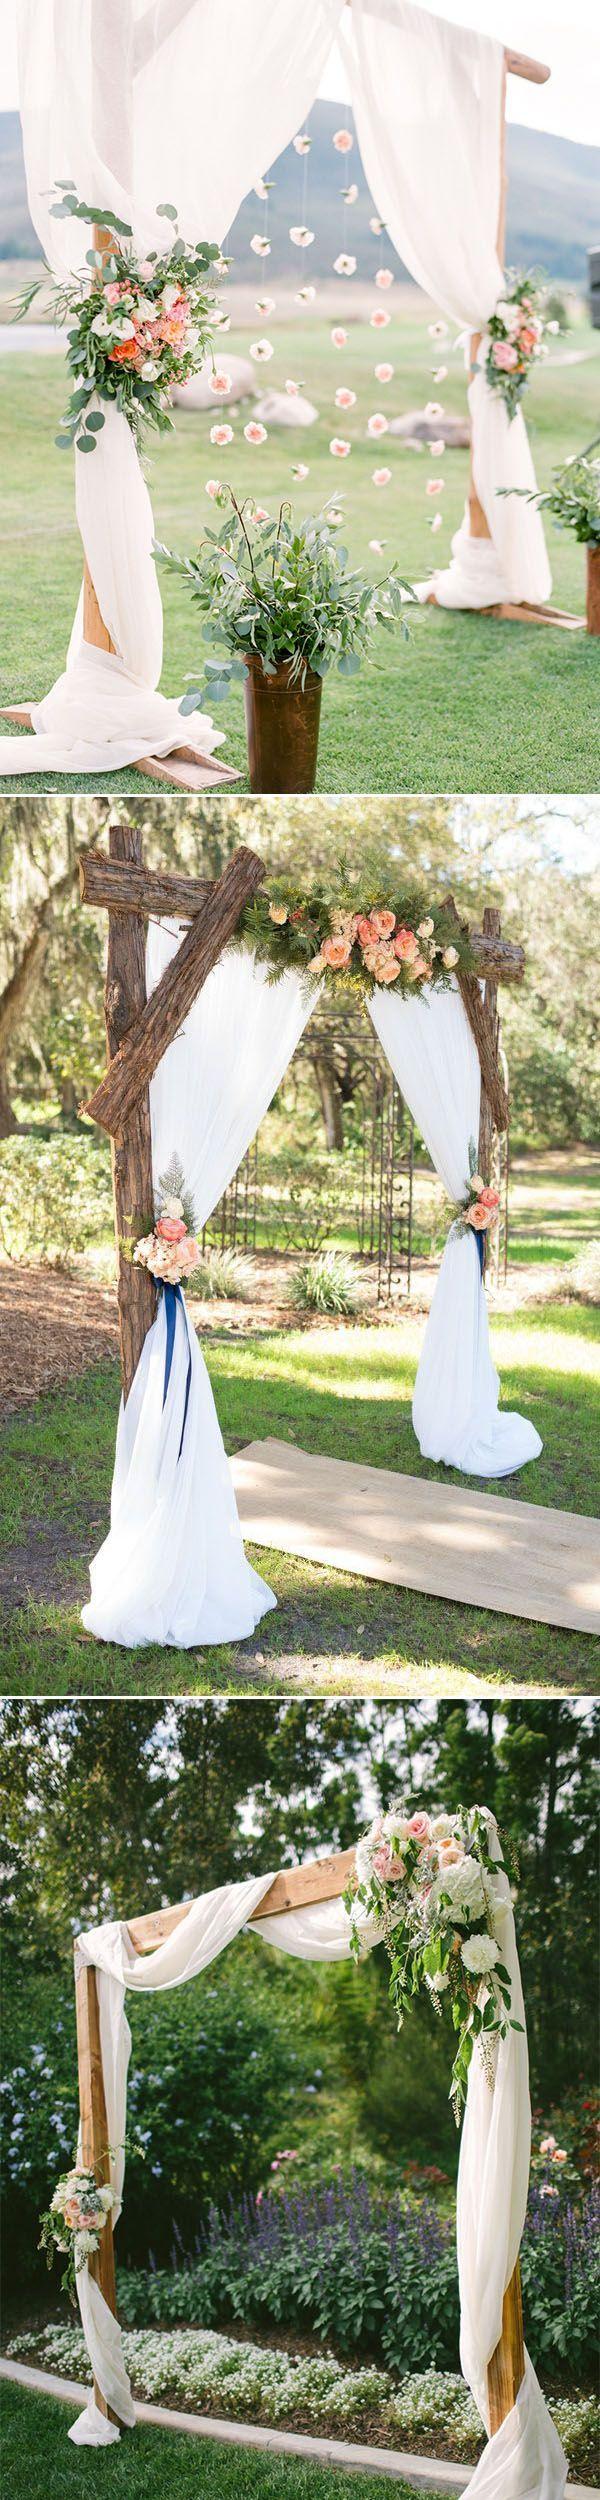 Wedding decoration ideas at church   Best Floral Wedding Altars u Arches Decorating Ideas  Pinterest